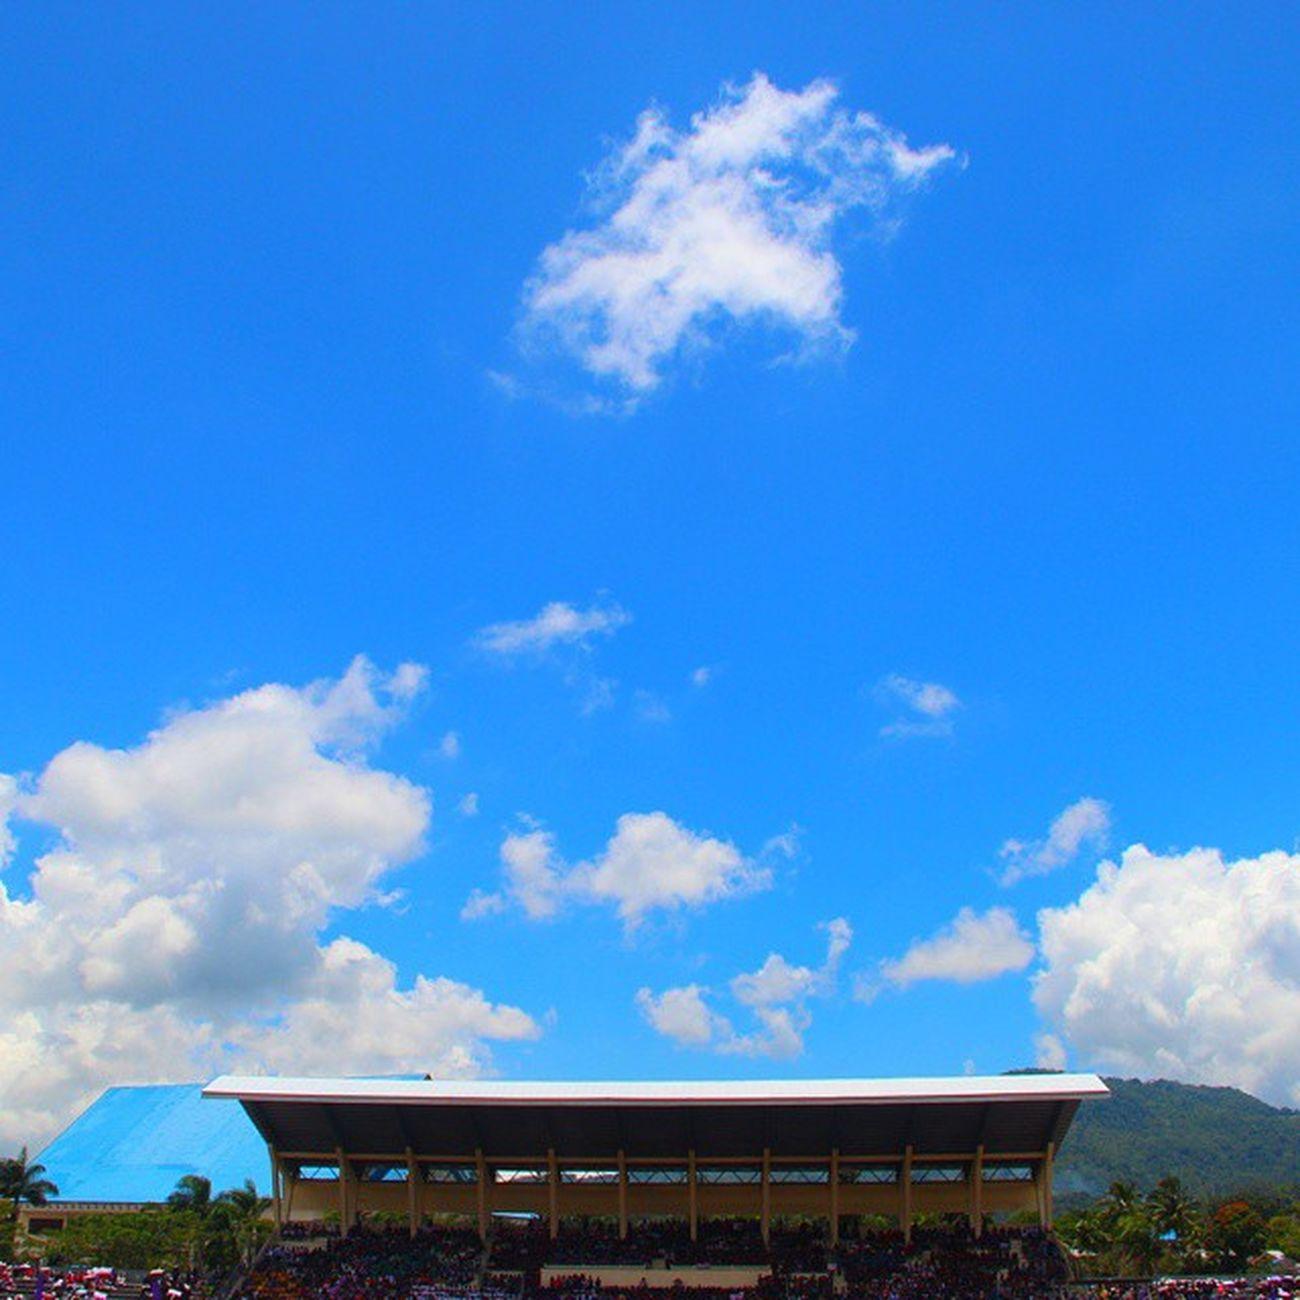 Lupa nama lapangannya. Yg jelas ini lapangan kemarin yg dipake buat tempat star jalan salib pemuda se-sulawesi utara LatePosting Tondano Lapangan IManado